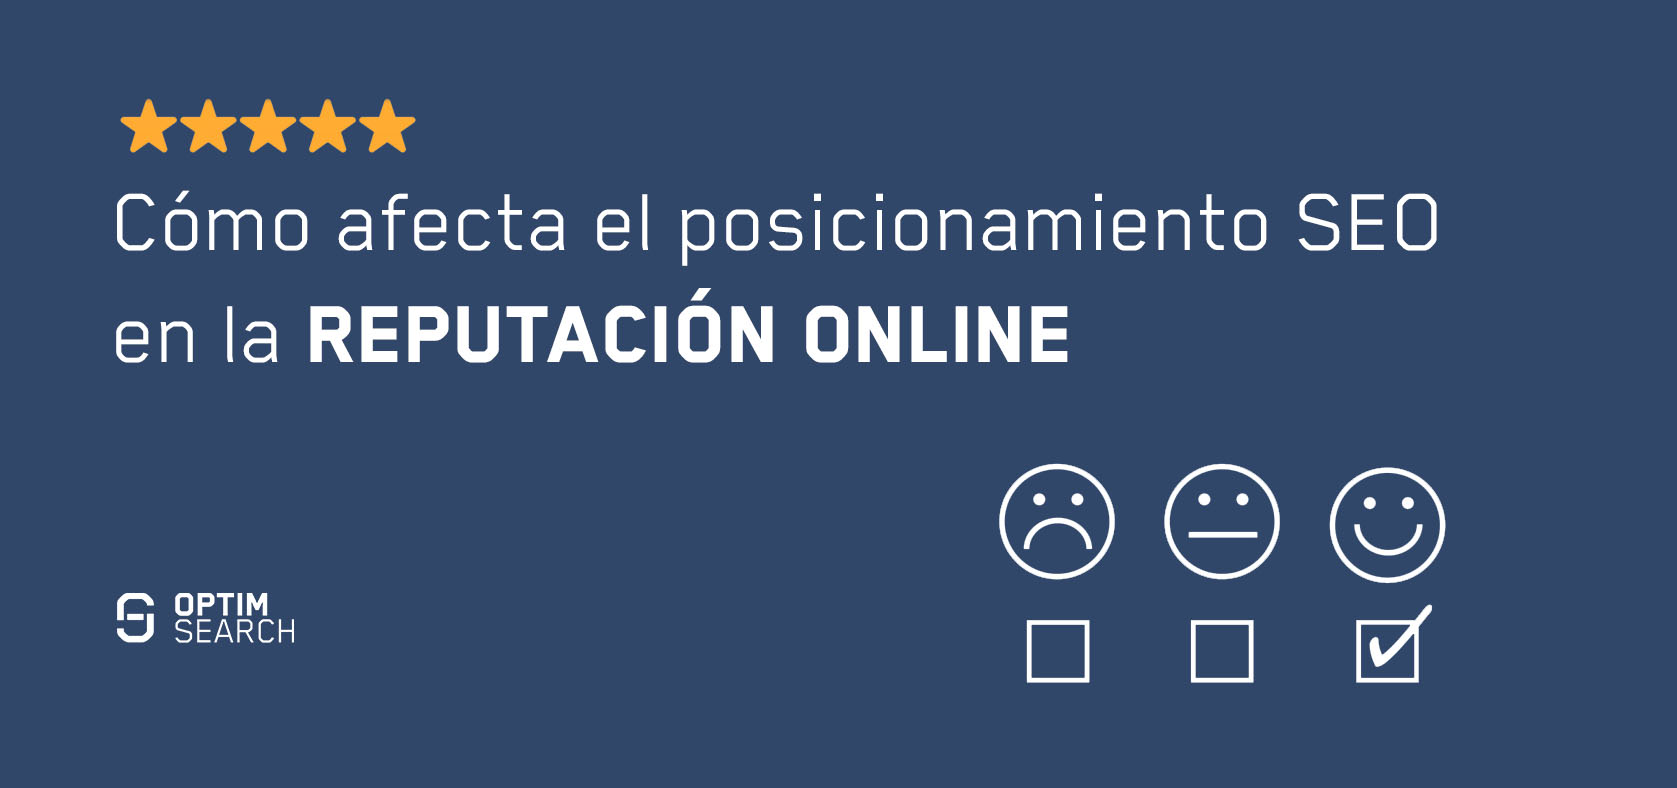 posicionamiento seo reputacion online